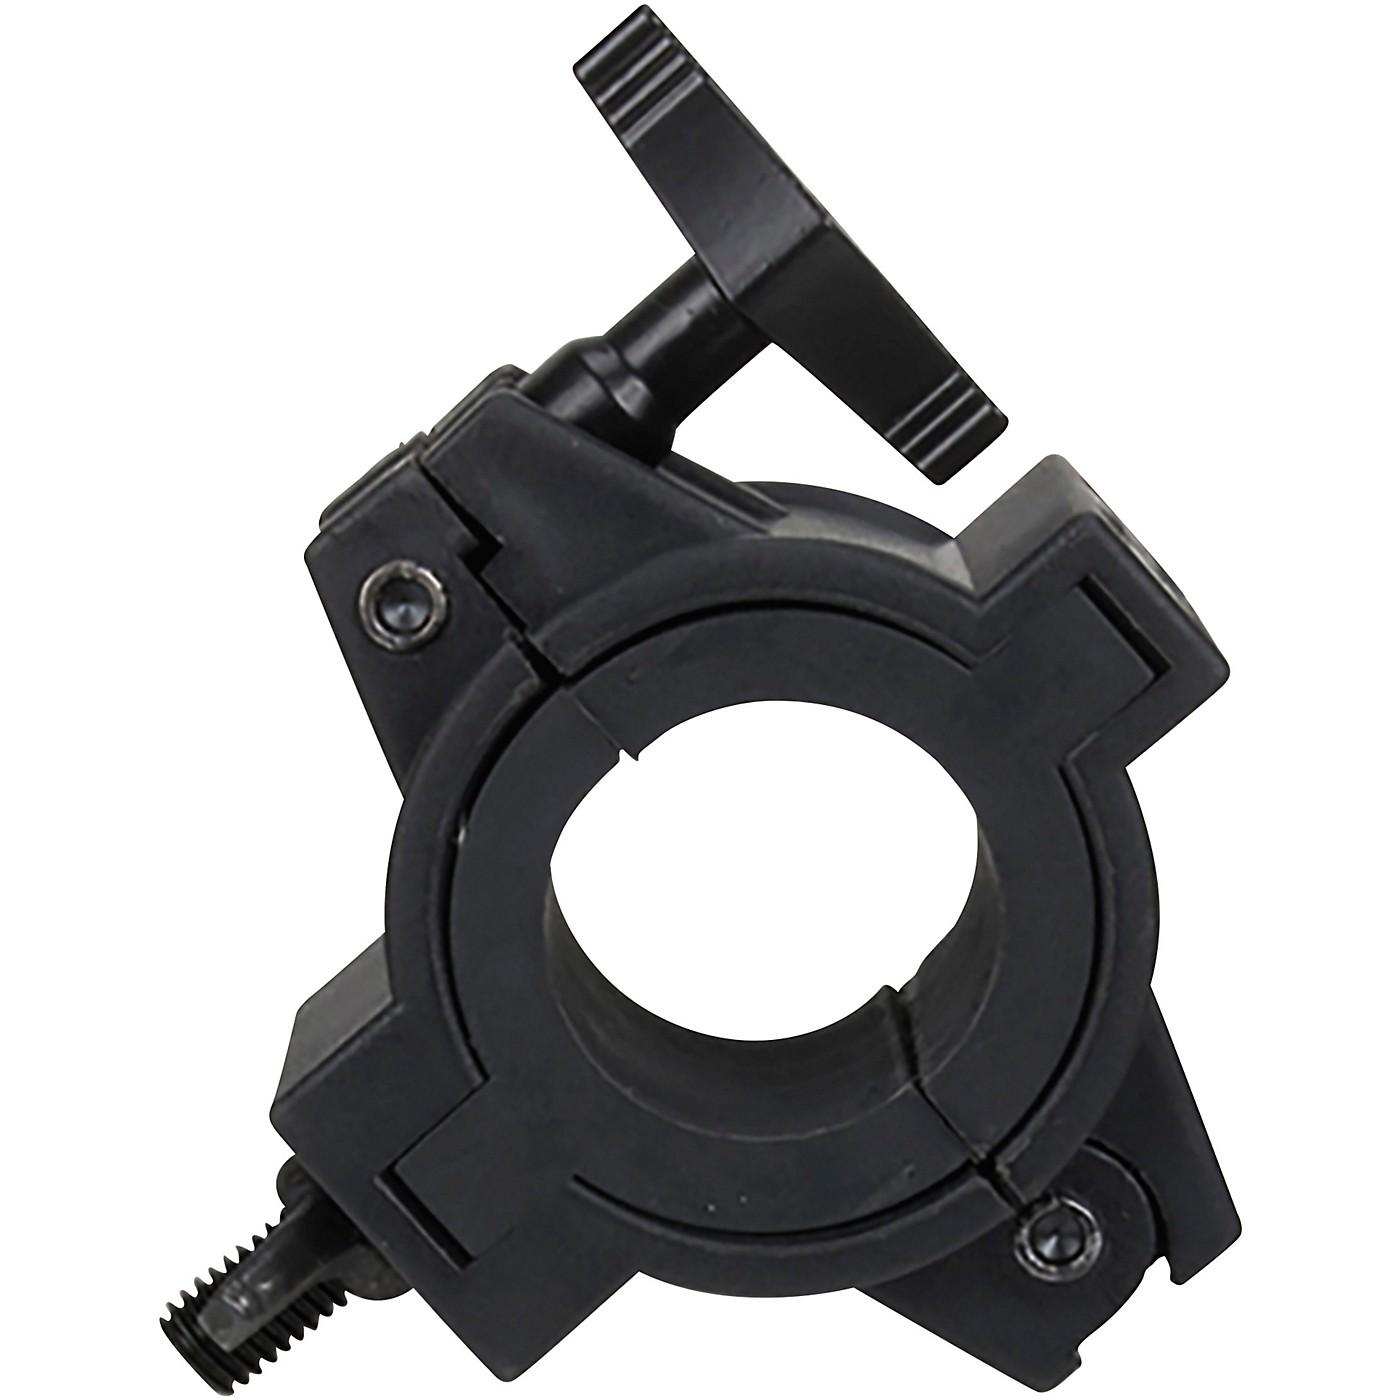 Eliminator Lighting O-clamp 1